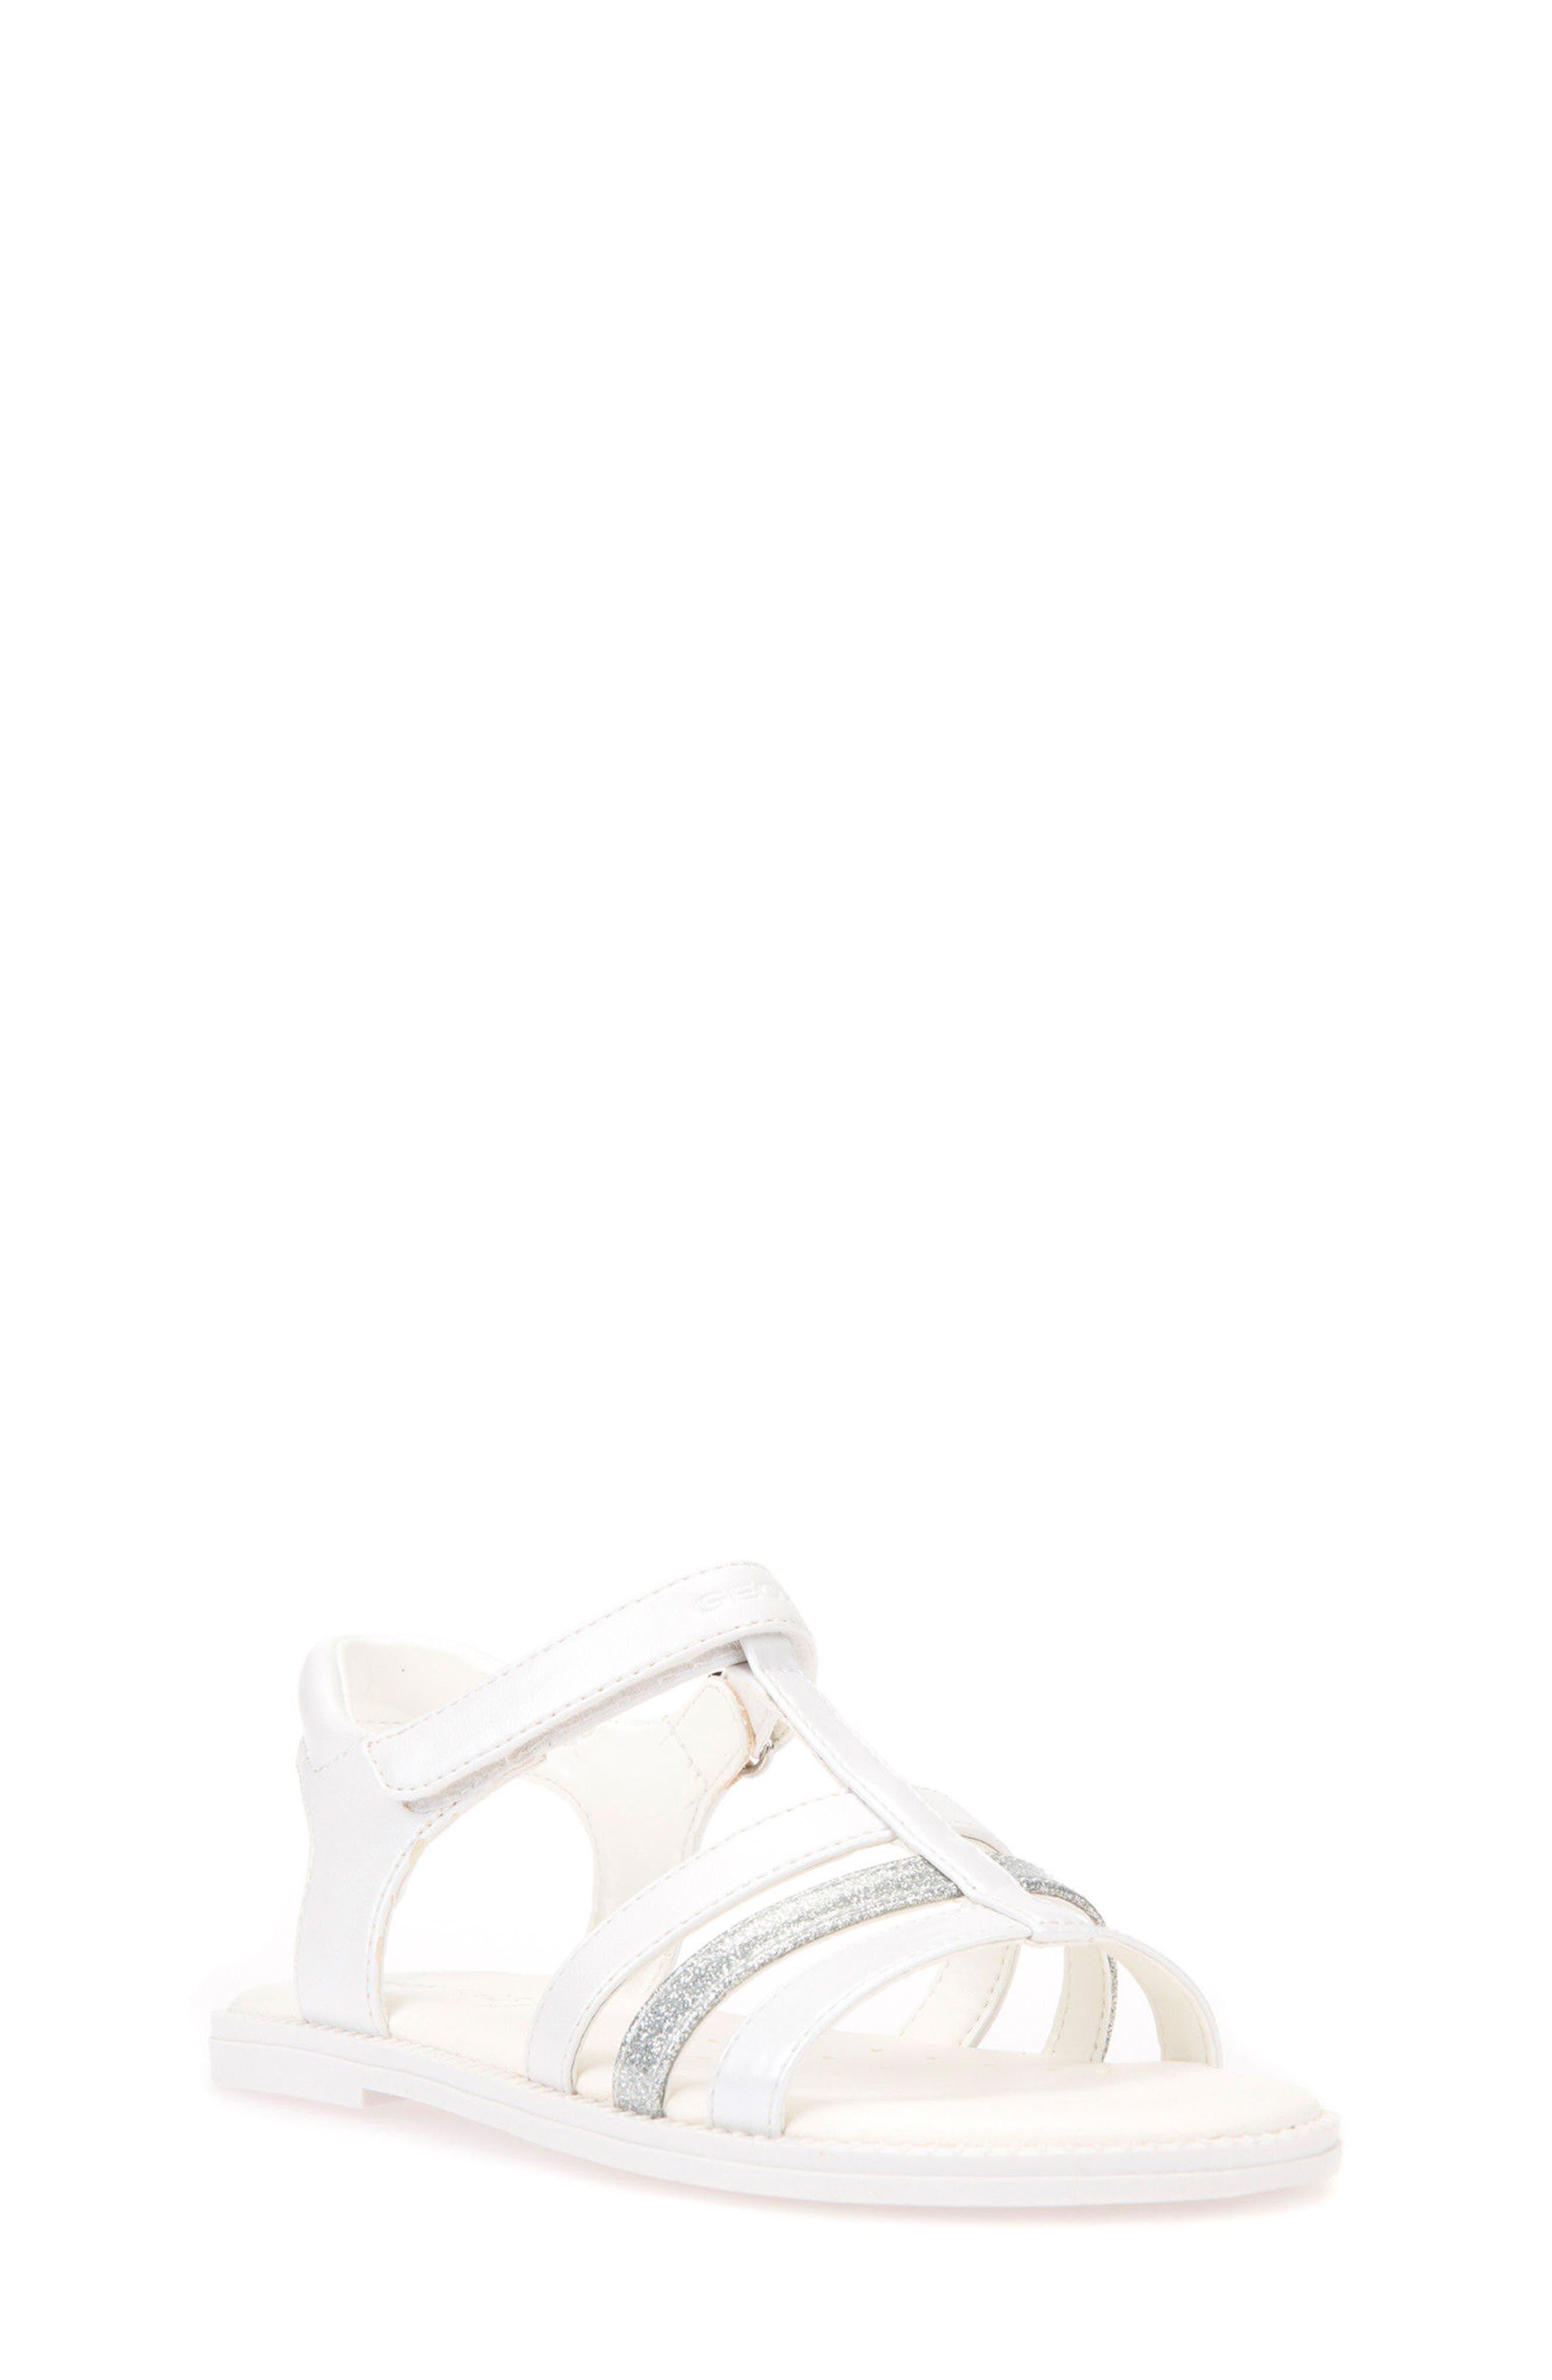 Karly Water Friendly Sandal,                             Main thumbnail 1, color,                             WHITE